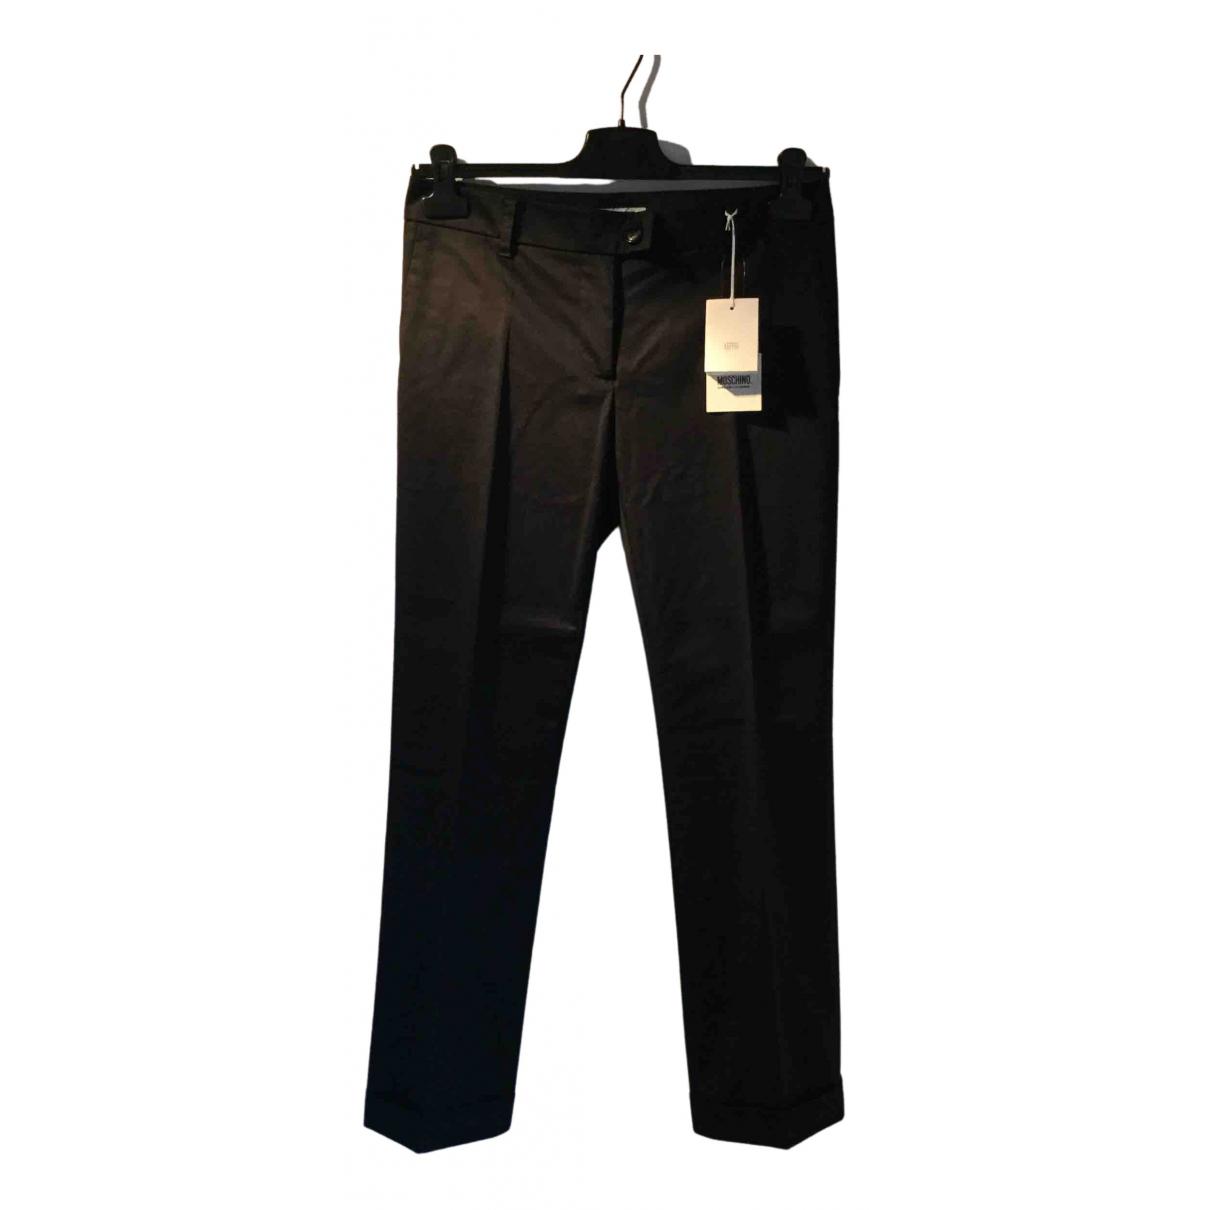 Moschino Cheap And Chic - Pantalon   pour femme en coton - noir